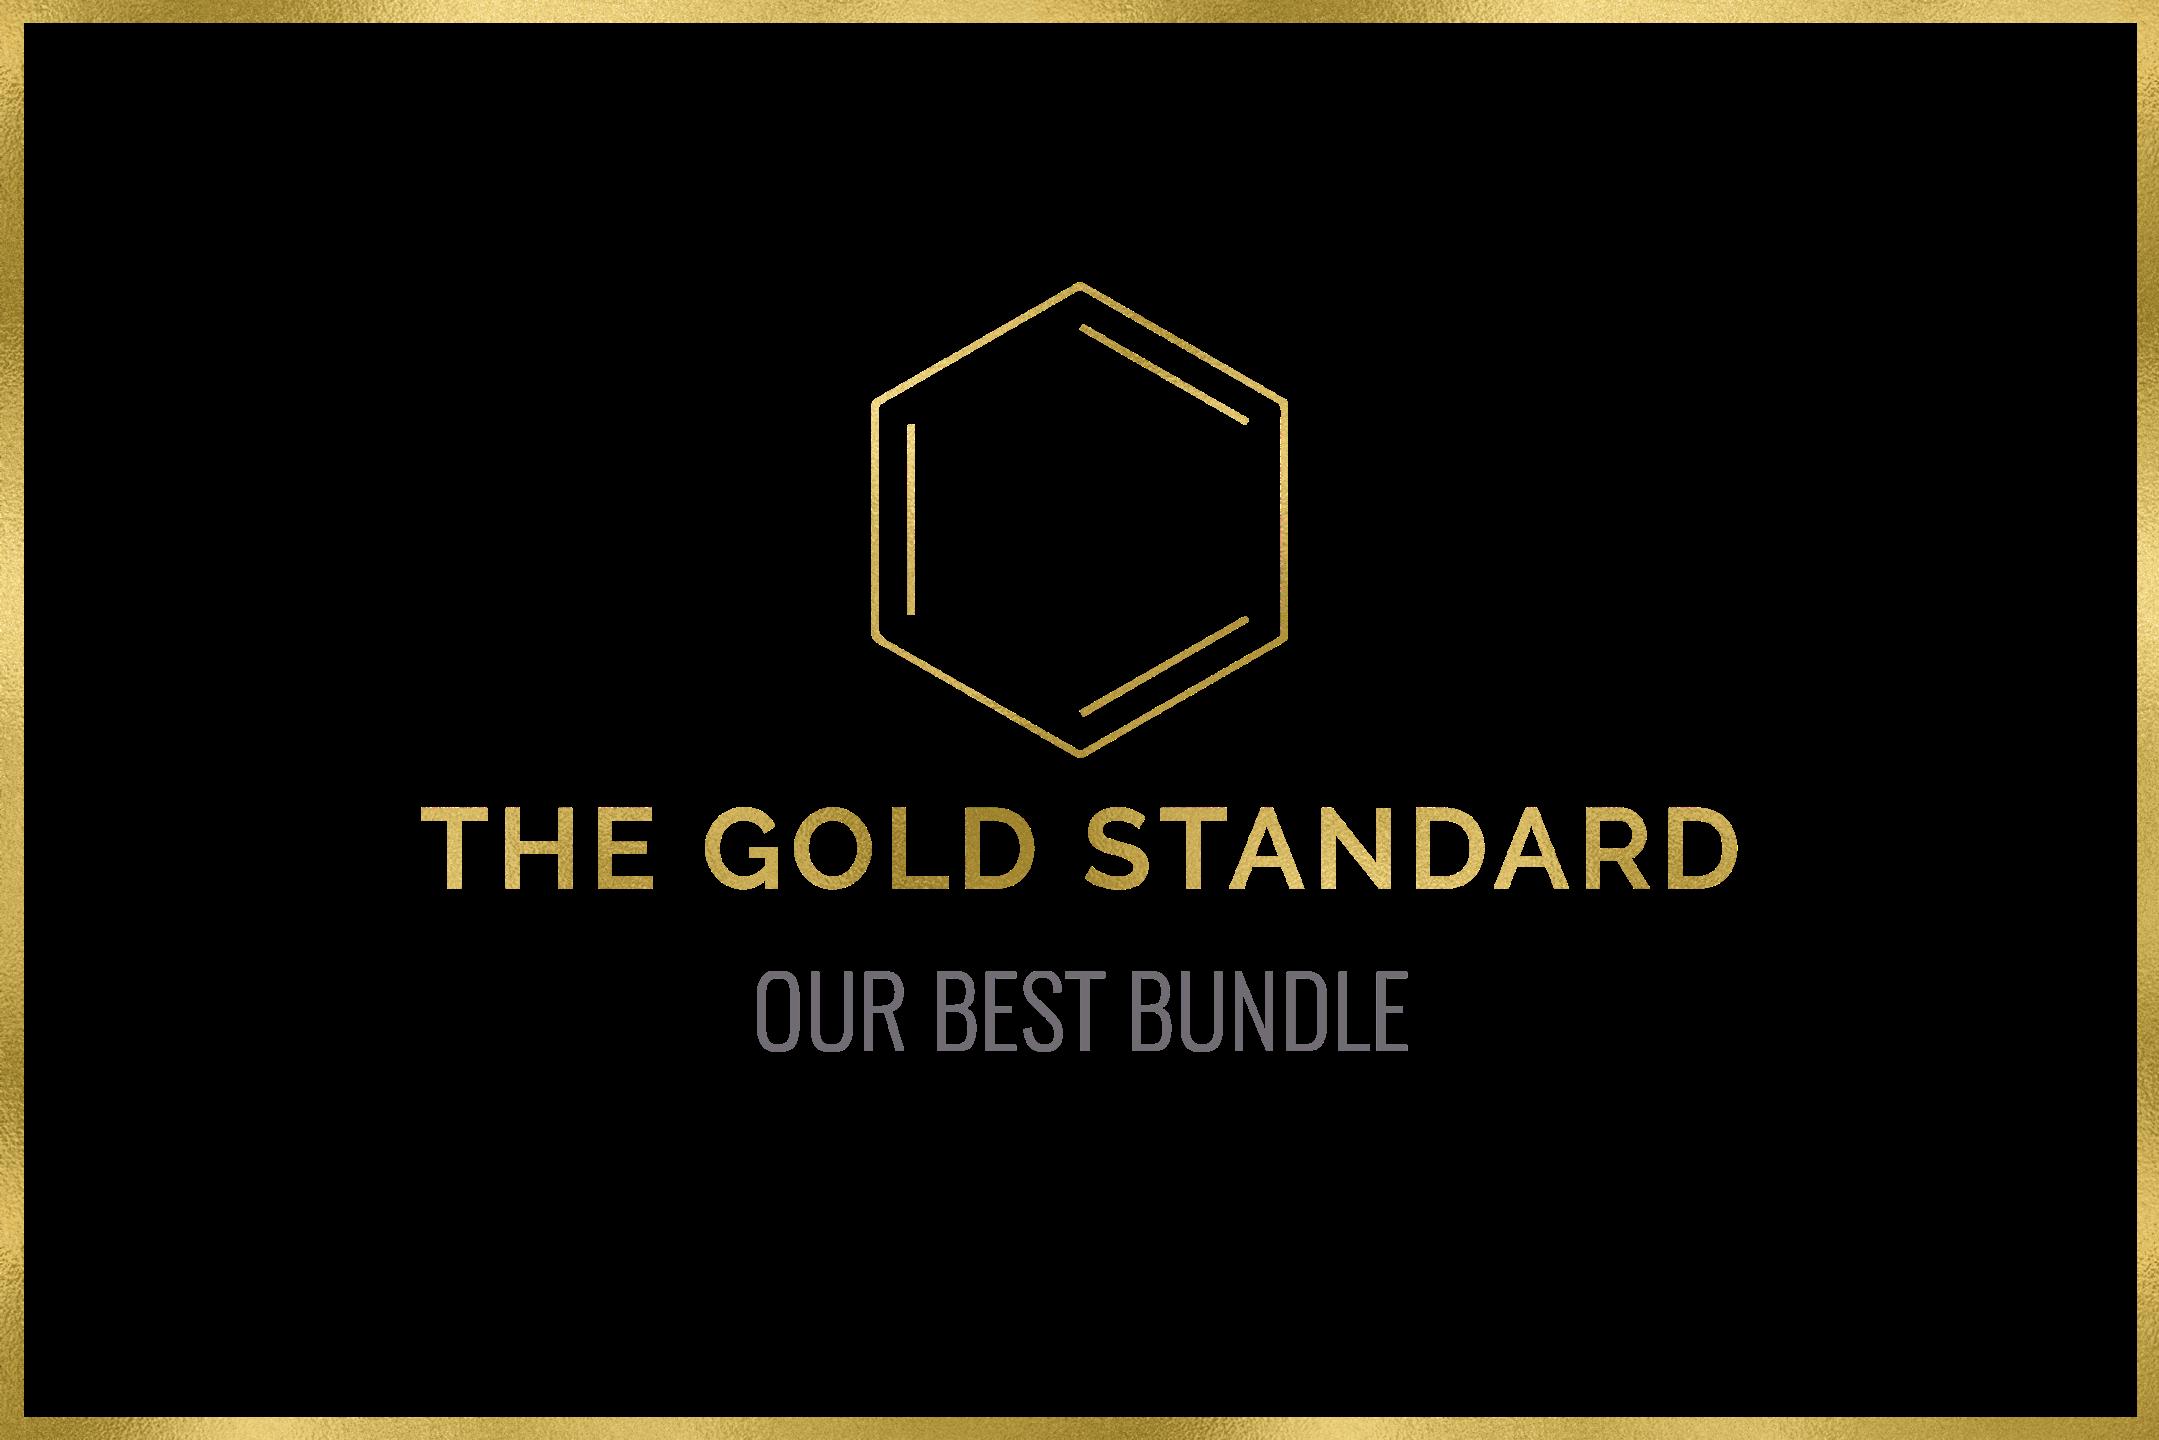 EOT Gold Standard logo